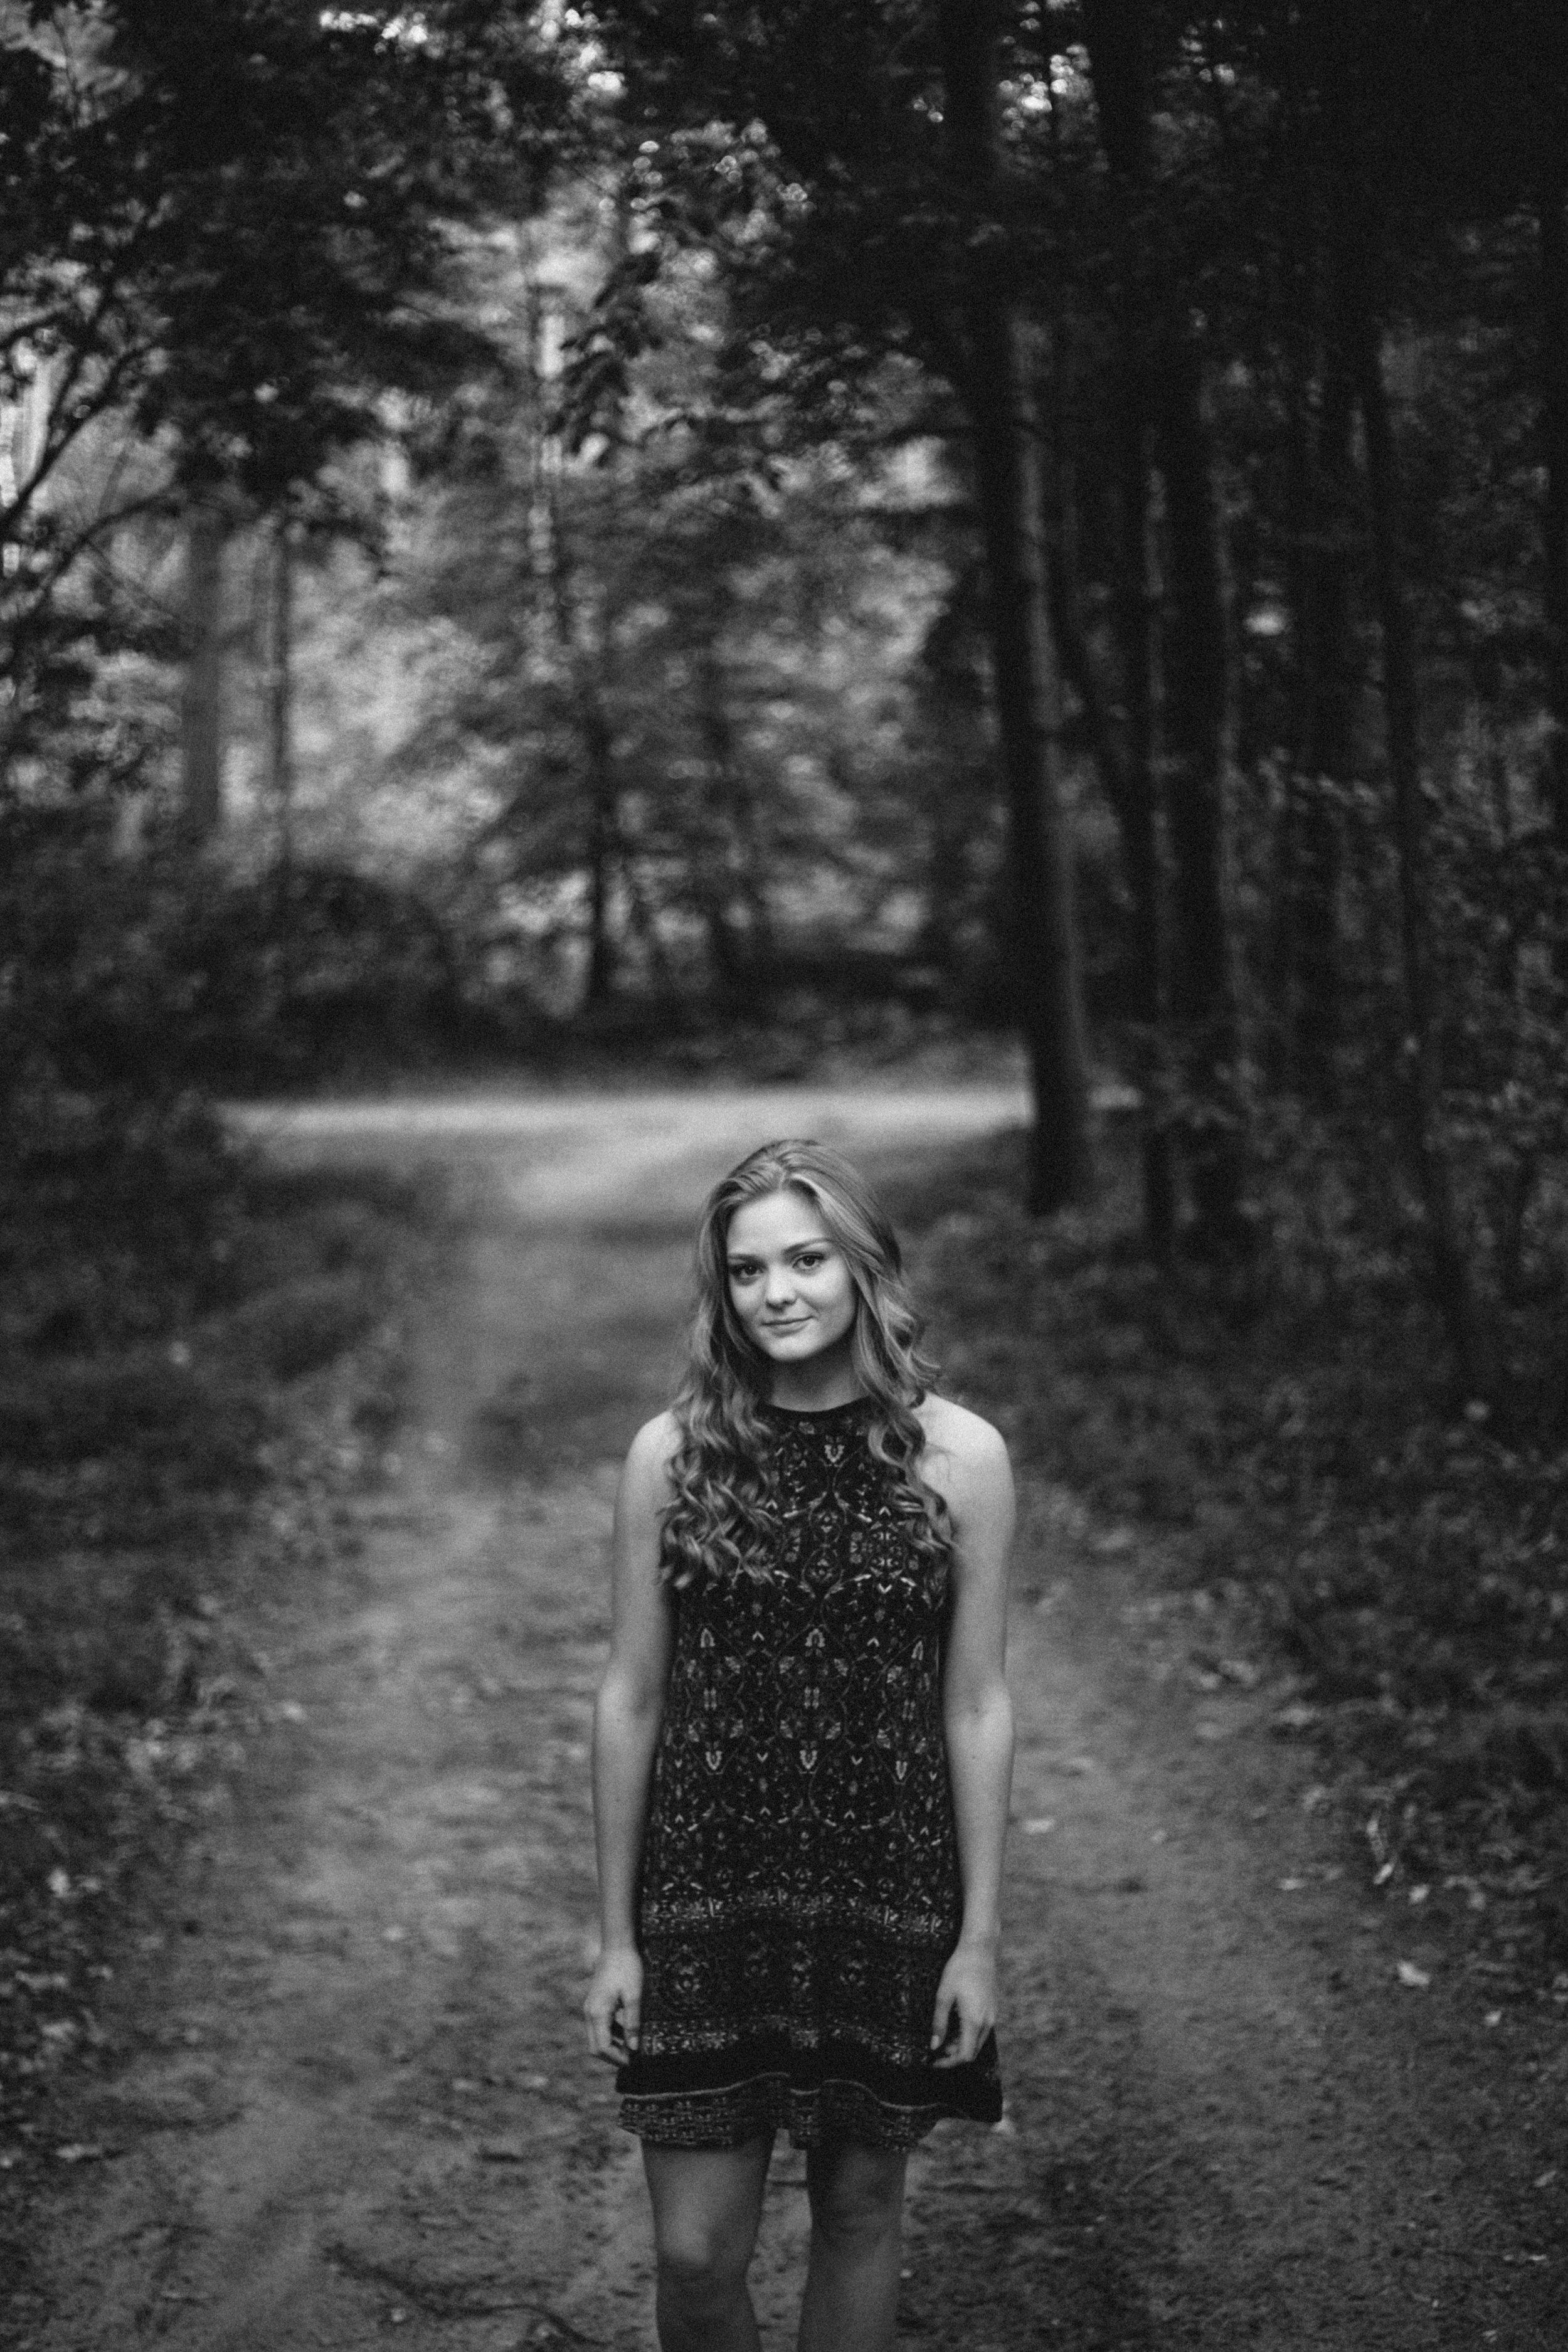 Brainerd Minnesota black and white artistic high school senior portrait photographed by Britt DeZeeuw